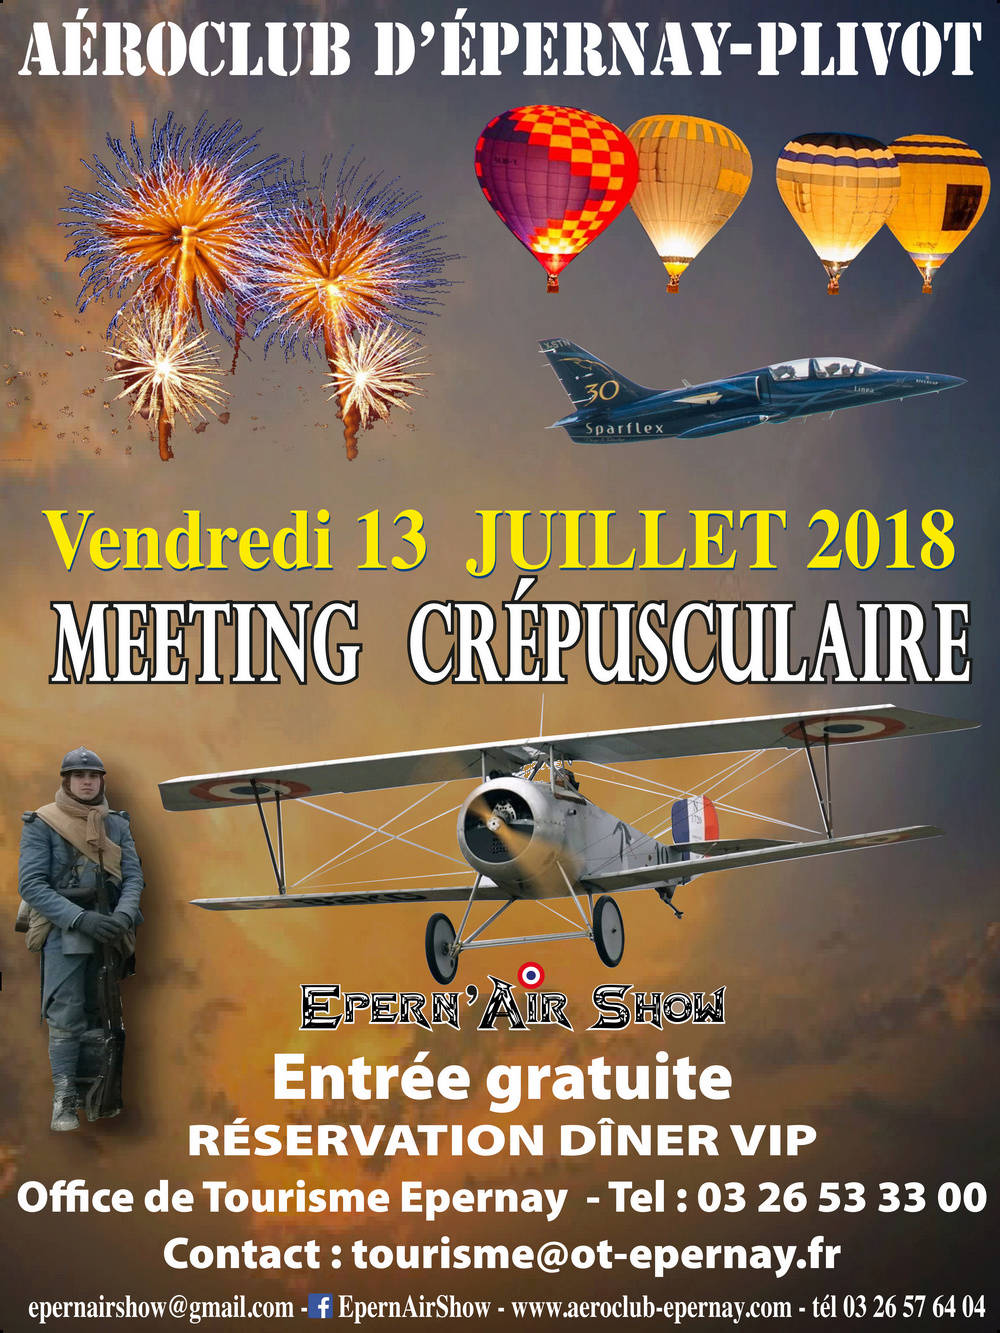 Epern'Air Show 2018, Aérodrome de plivot , Champagne-Ardenne ,meeting aerien 2018